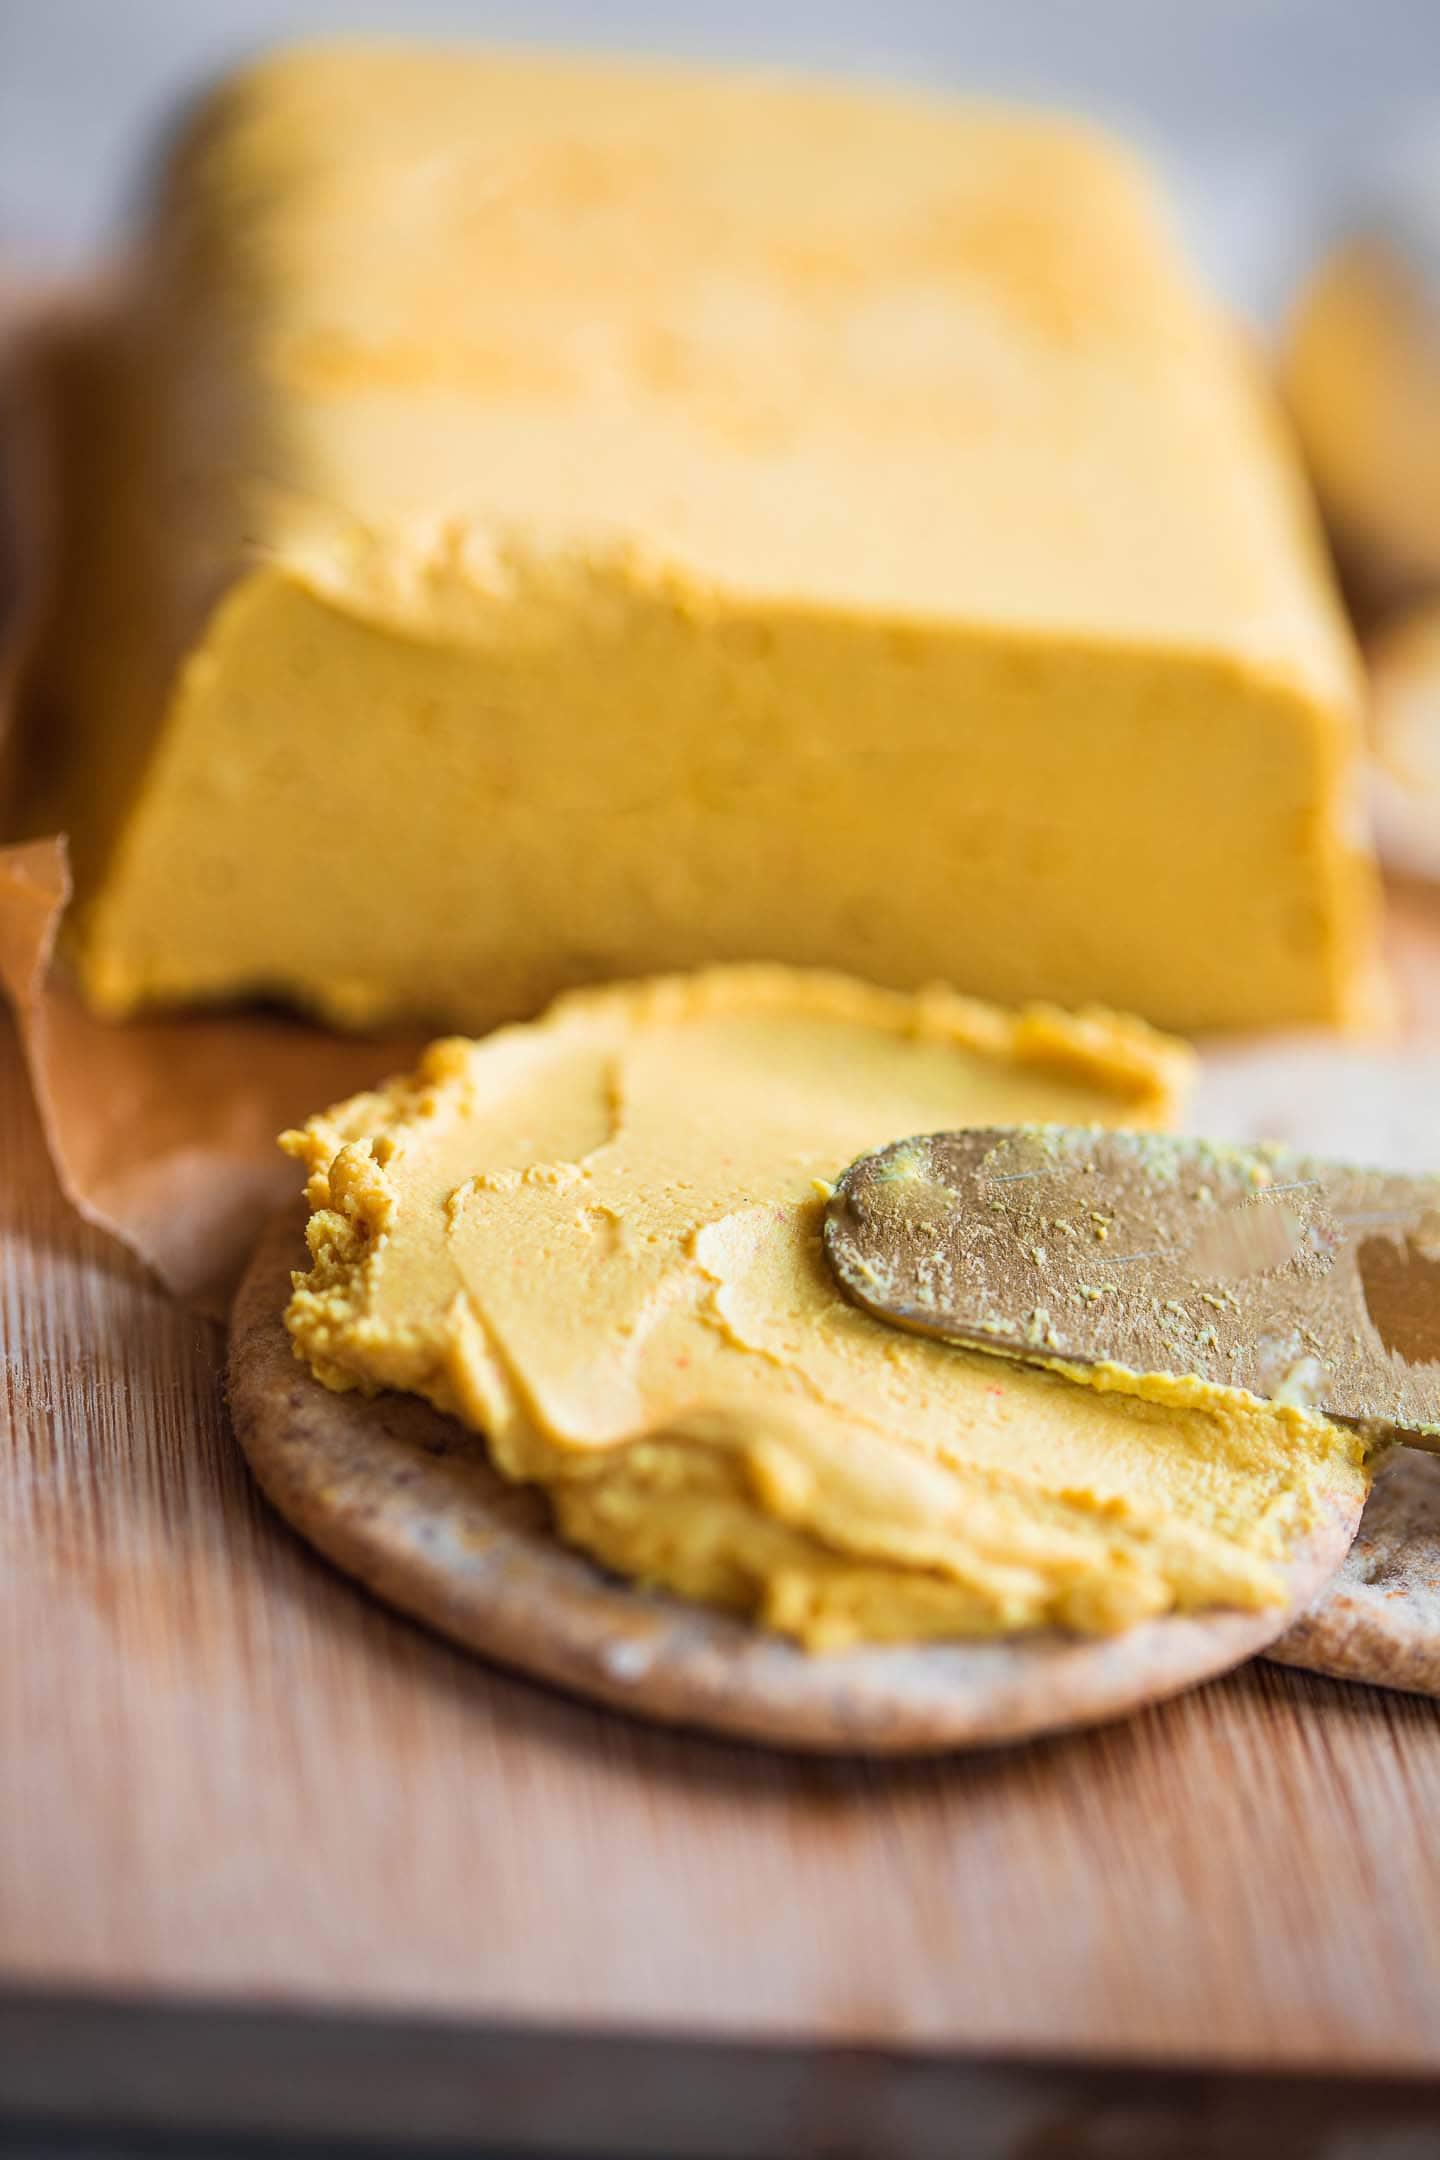 Spreadable vegan cheese on a cracker